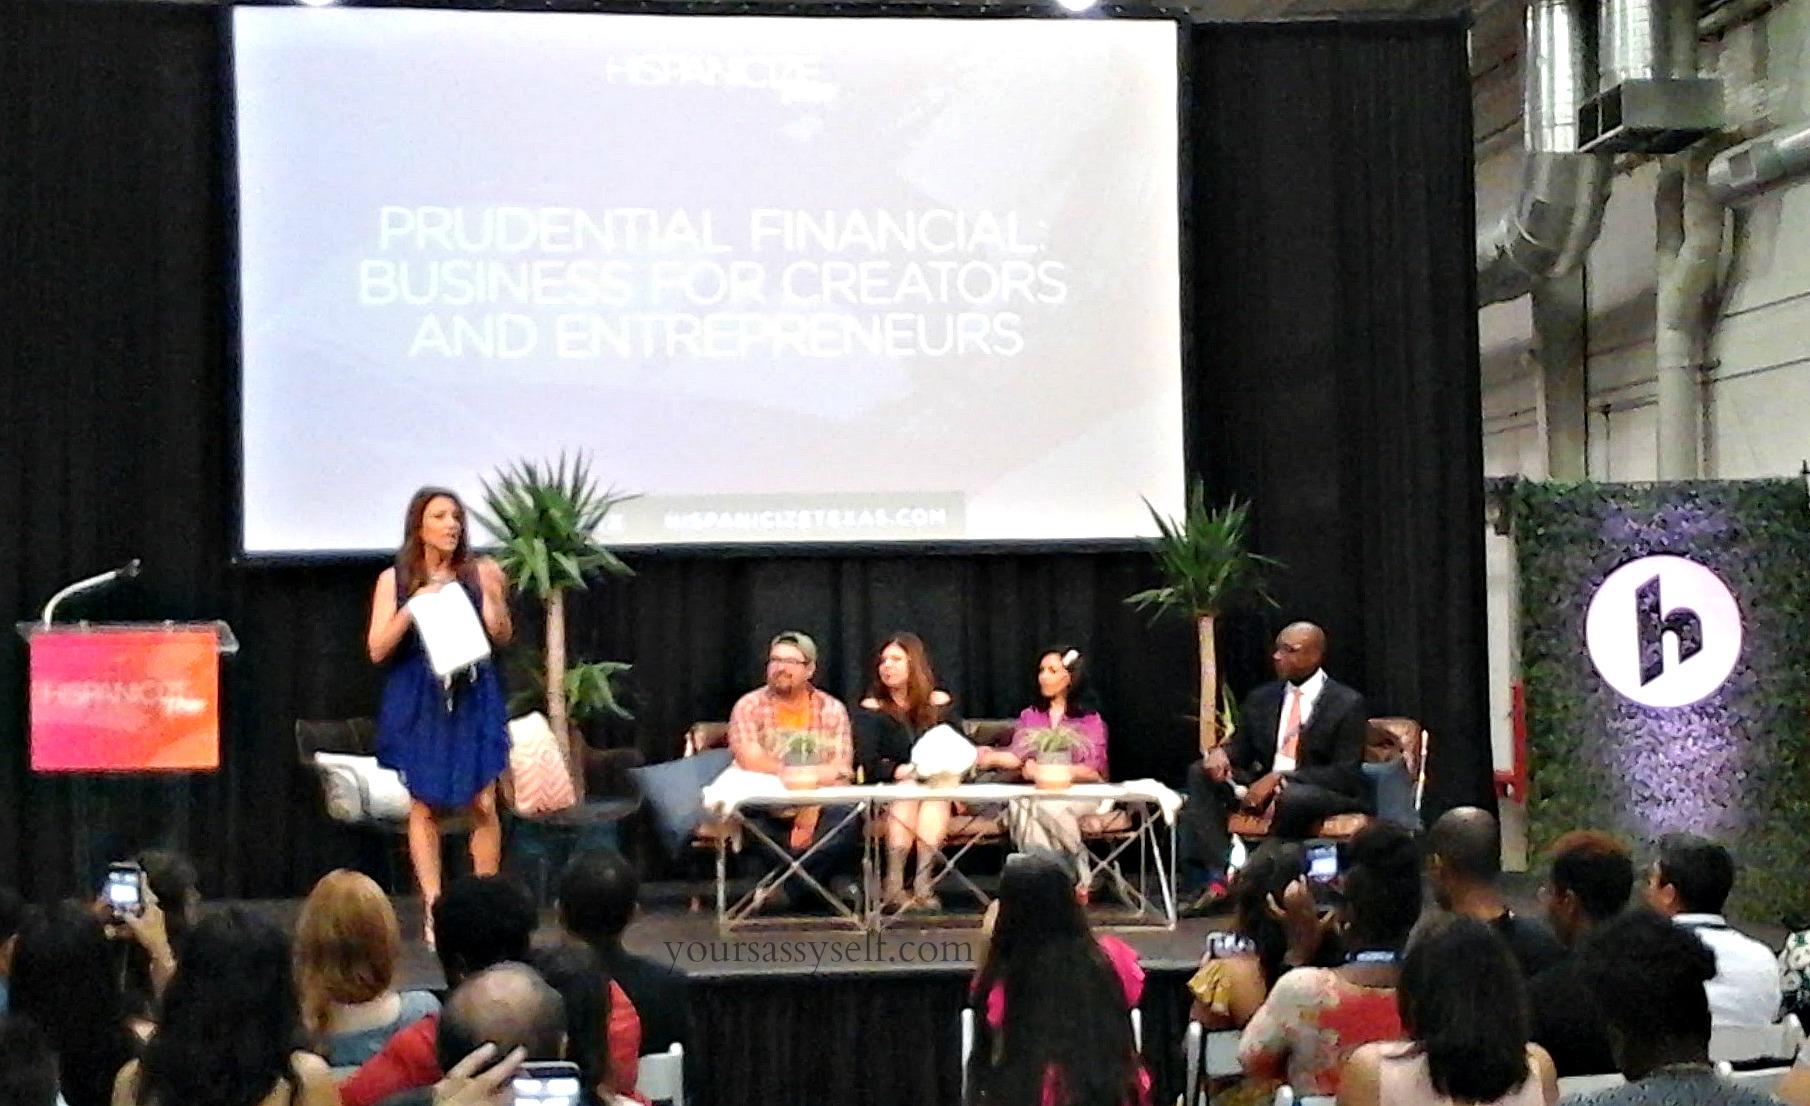 Lili Gil hosting Prudential Panel at HispzTX 2017 - yoursassyself.com